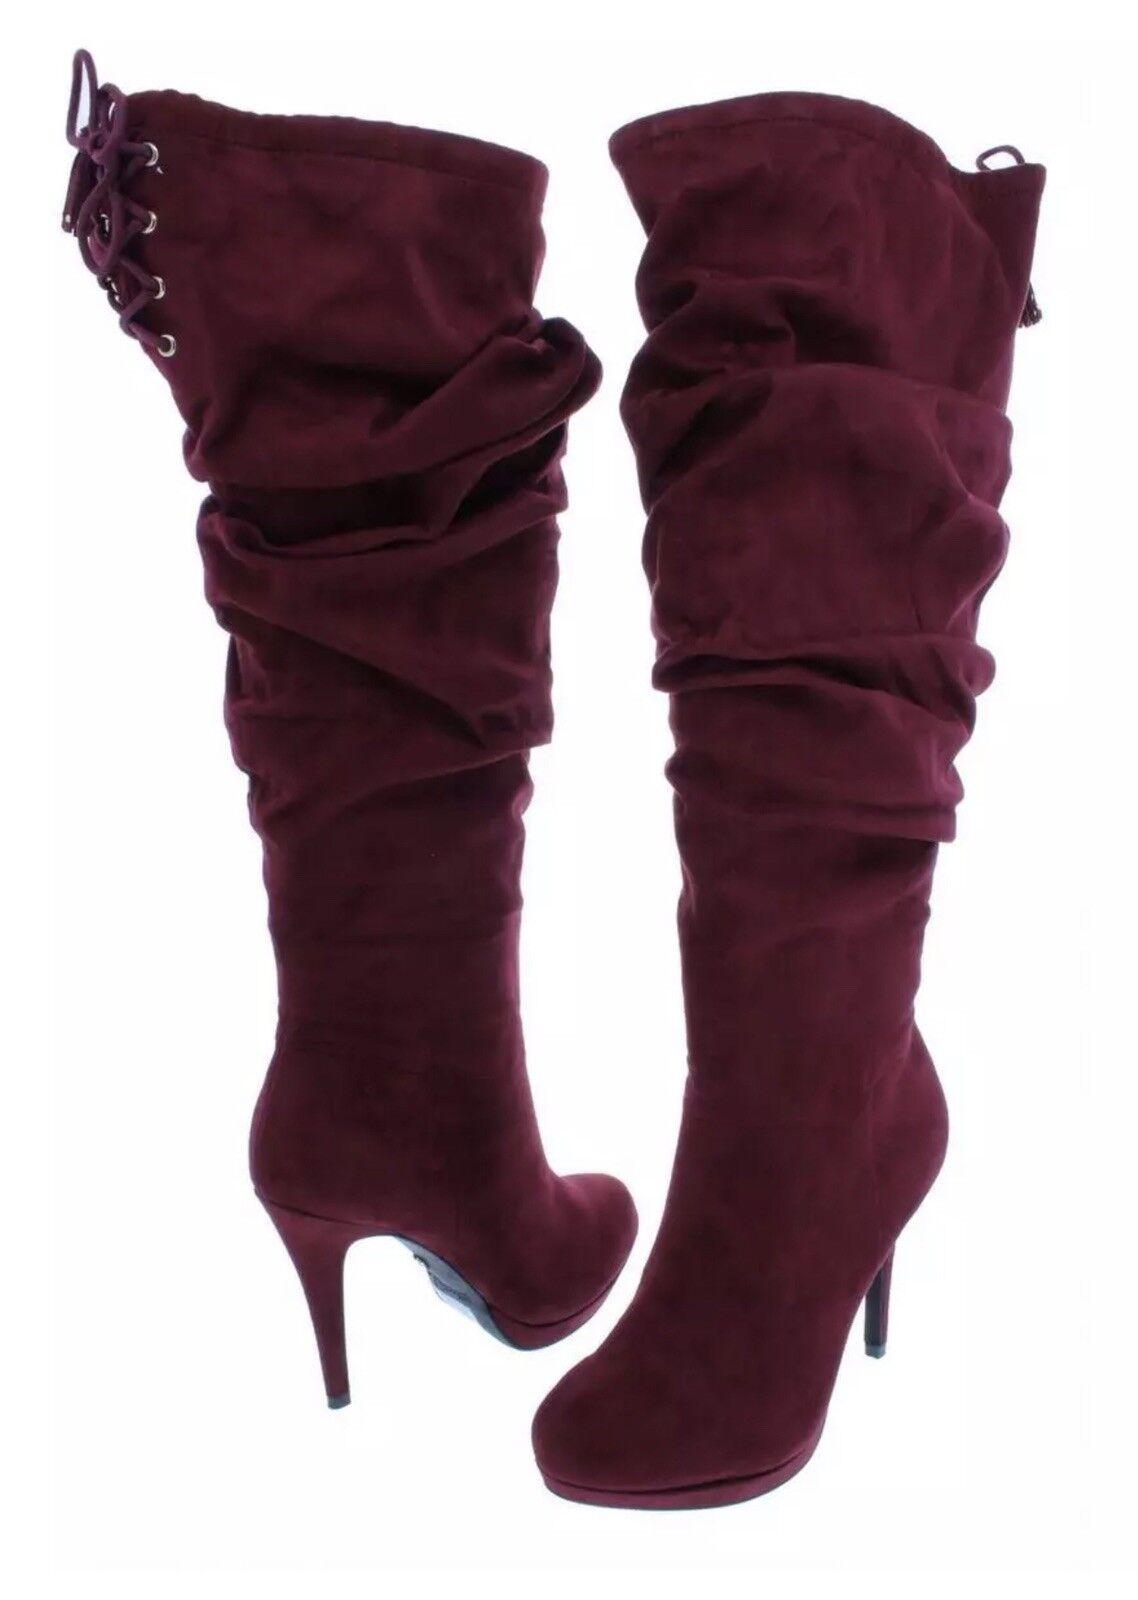 Thalia Sodi Womens Womens Womens Brisa Red Dress Boots shoes 11 Wide Retail  225.00 935539